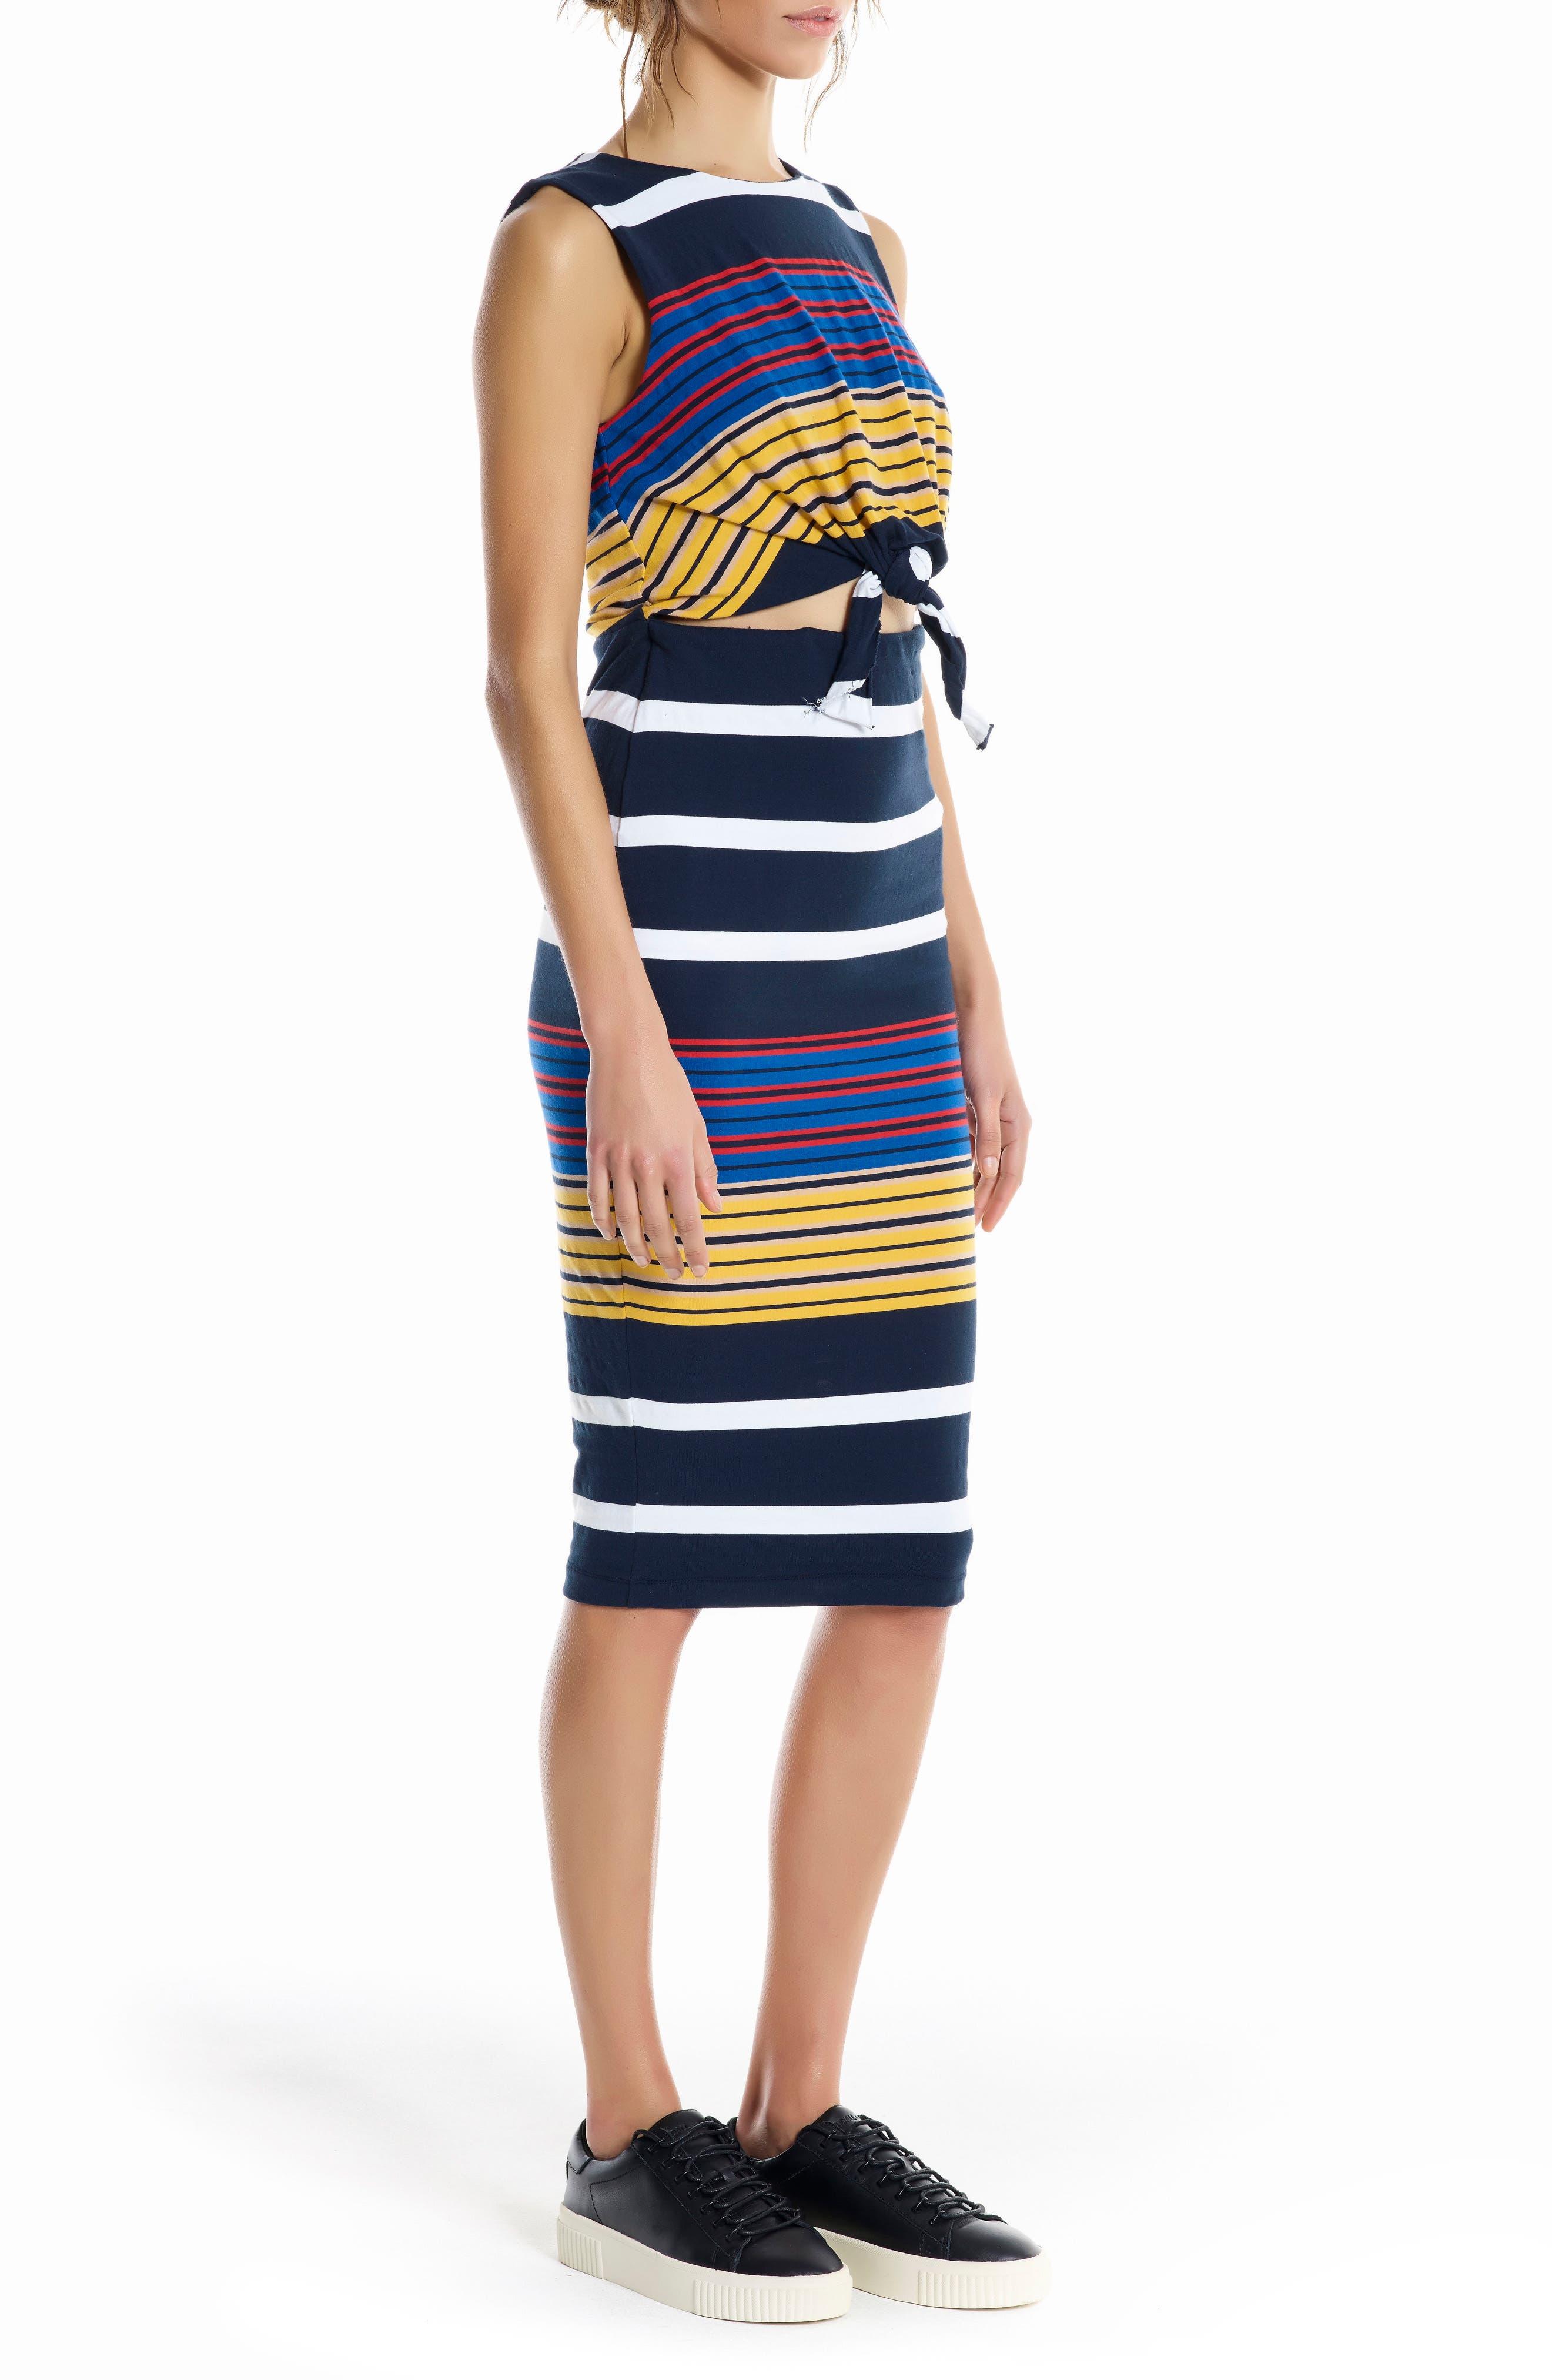 KENDELL + KYLIE Stripe Midi Dress,                             Alternate thumbnail 3, color,                             001